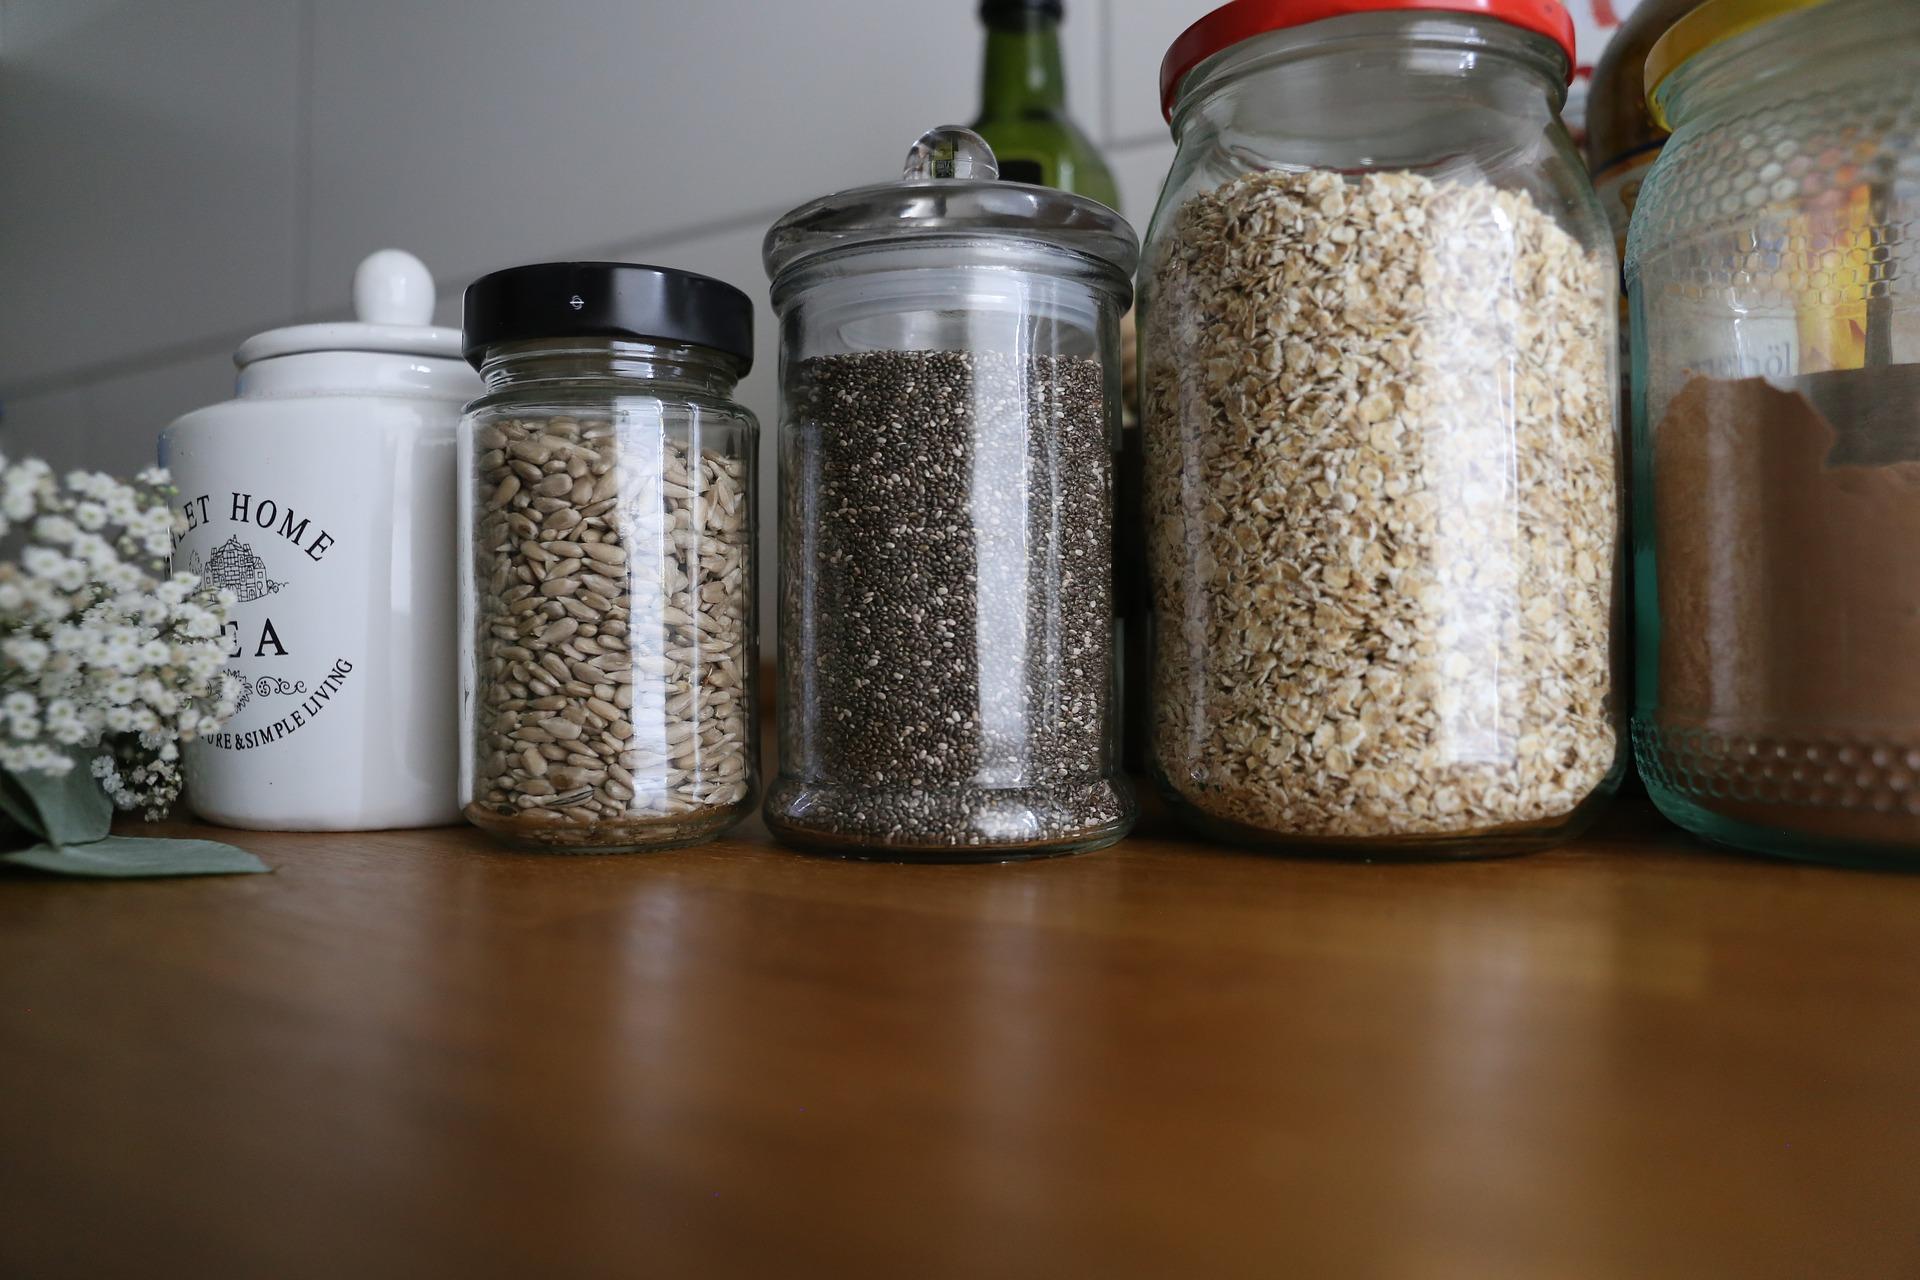 seeds-2908636_1920.jpg